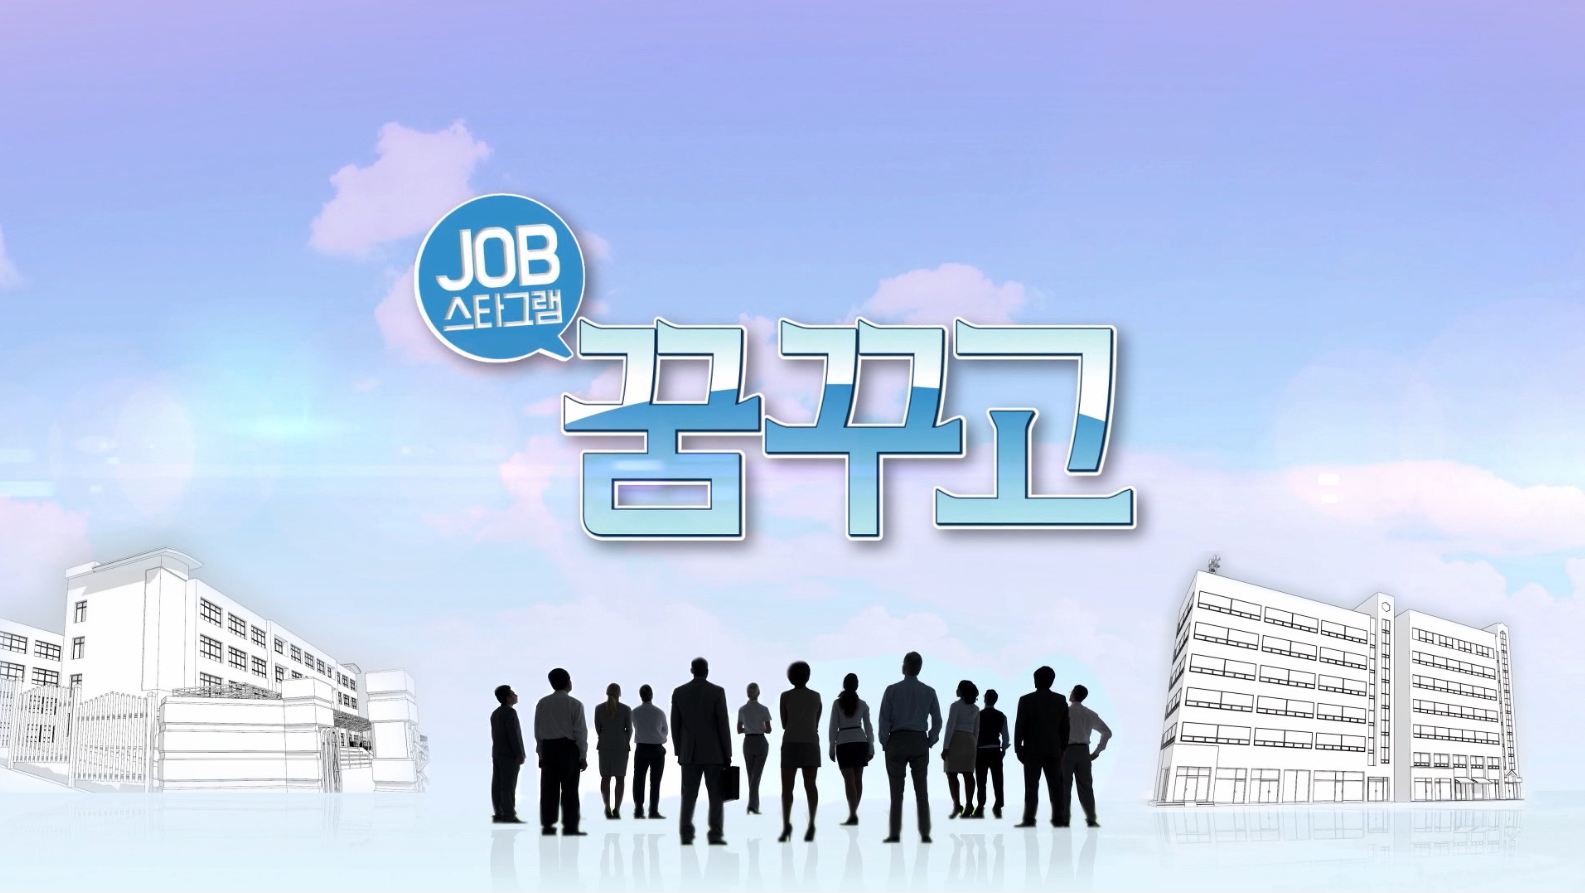 [JOB스타그램 꿈꾸고 180326]대한민국 먹거리 내가 책임진다. 한국농수산식품유통공사 김수영